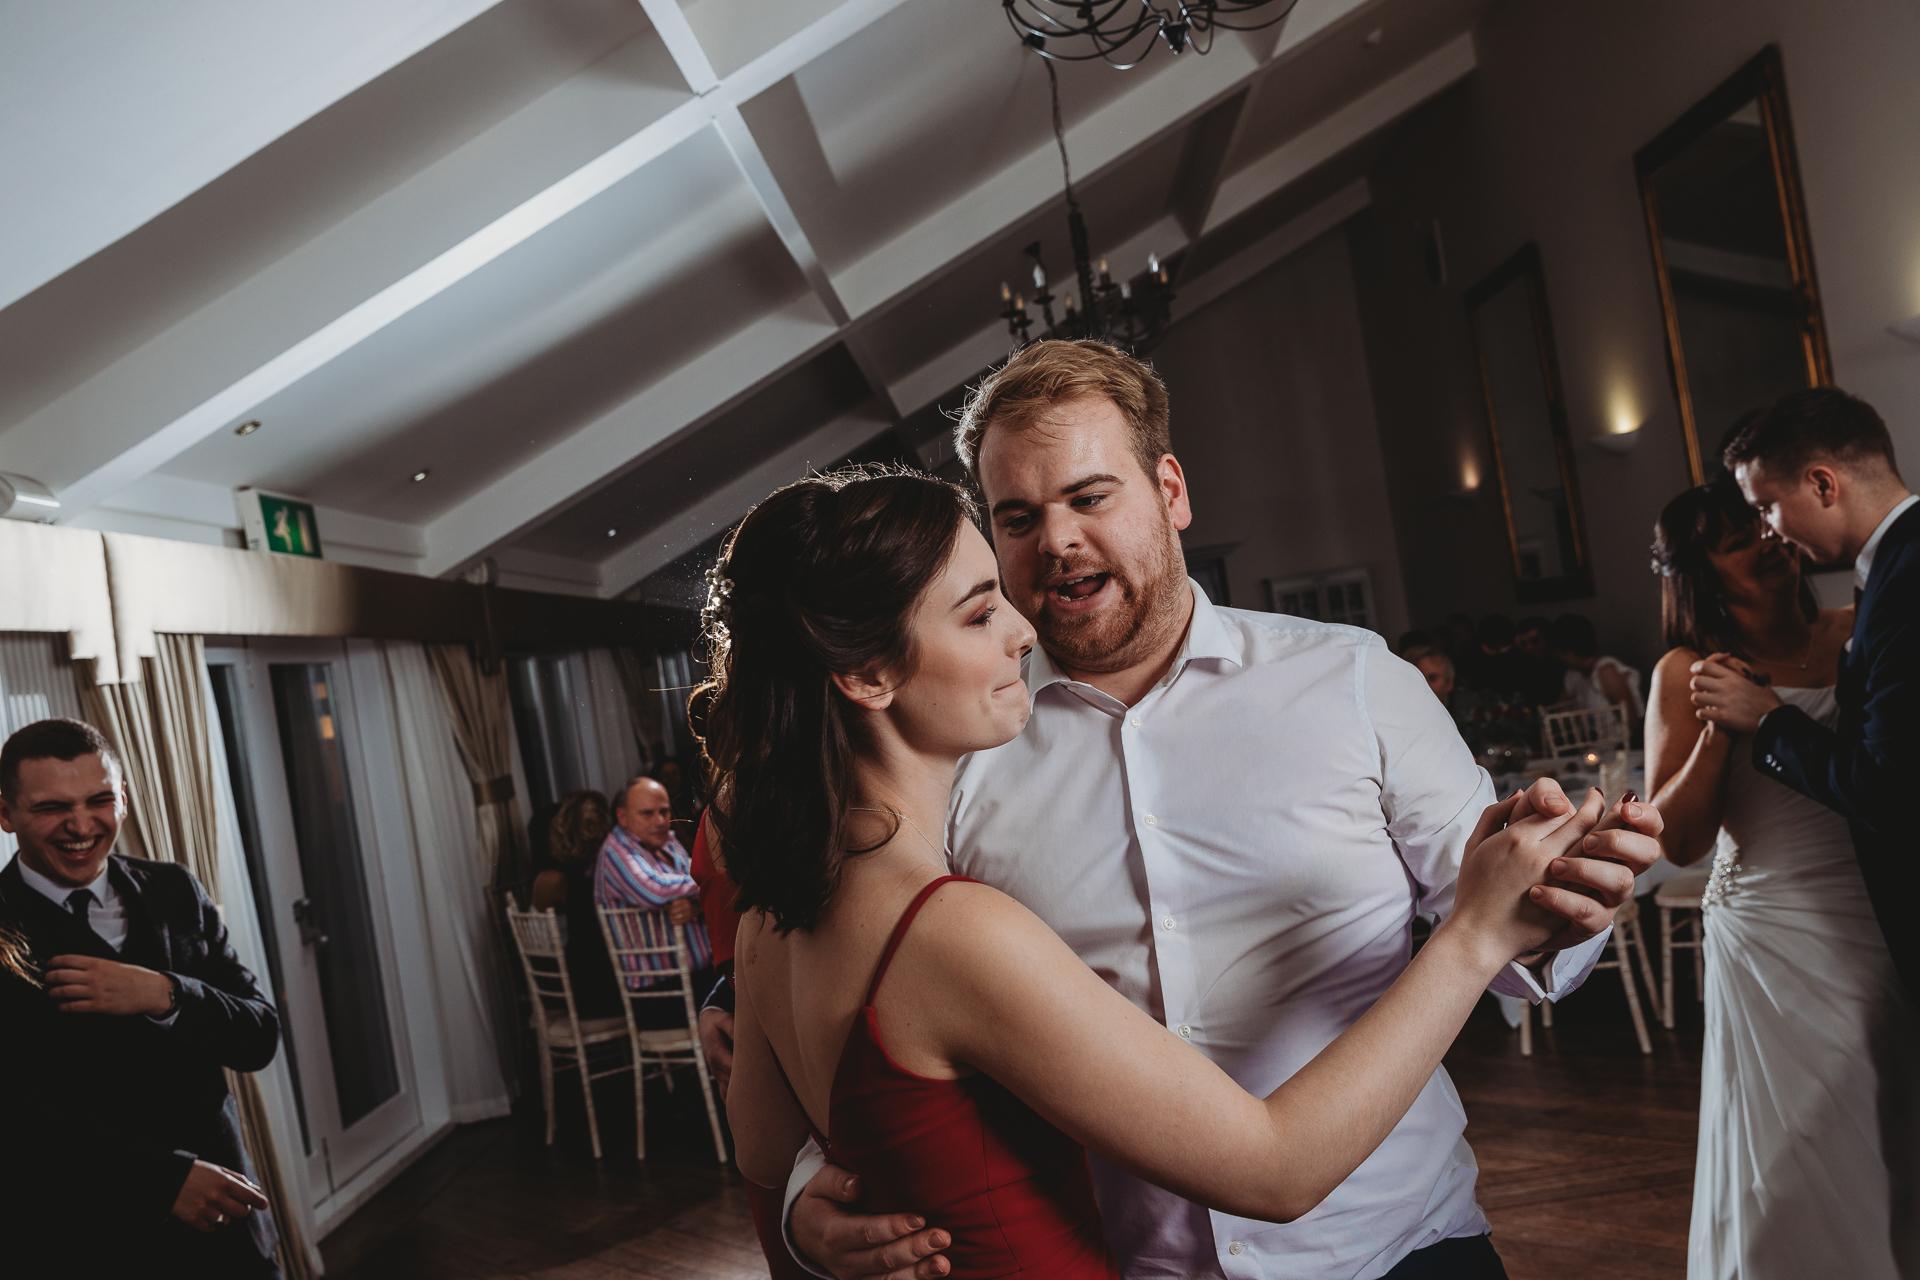 parlour at blagdon dancing, wedding photography